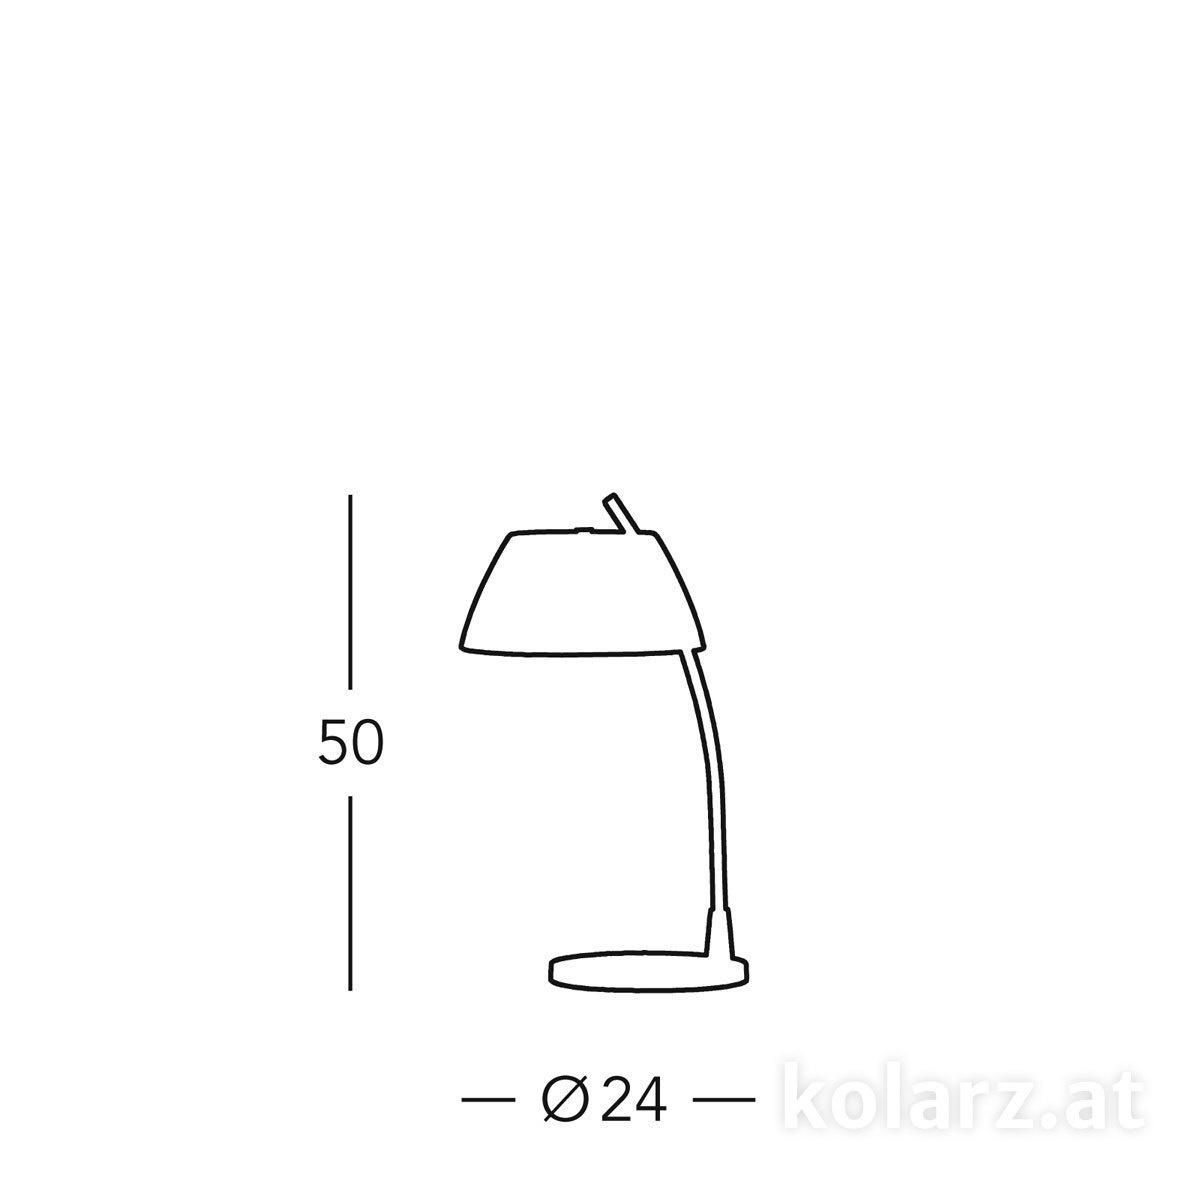 0051-71-6-s1.jpg